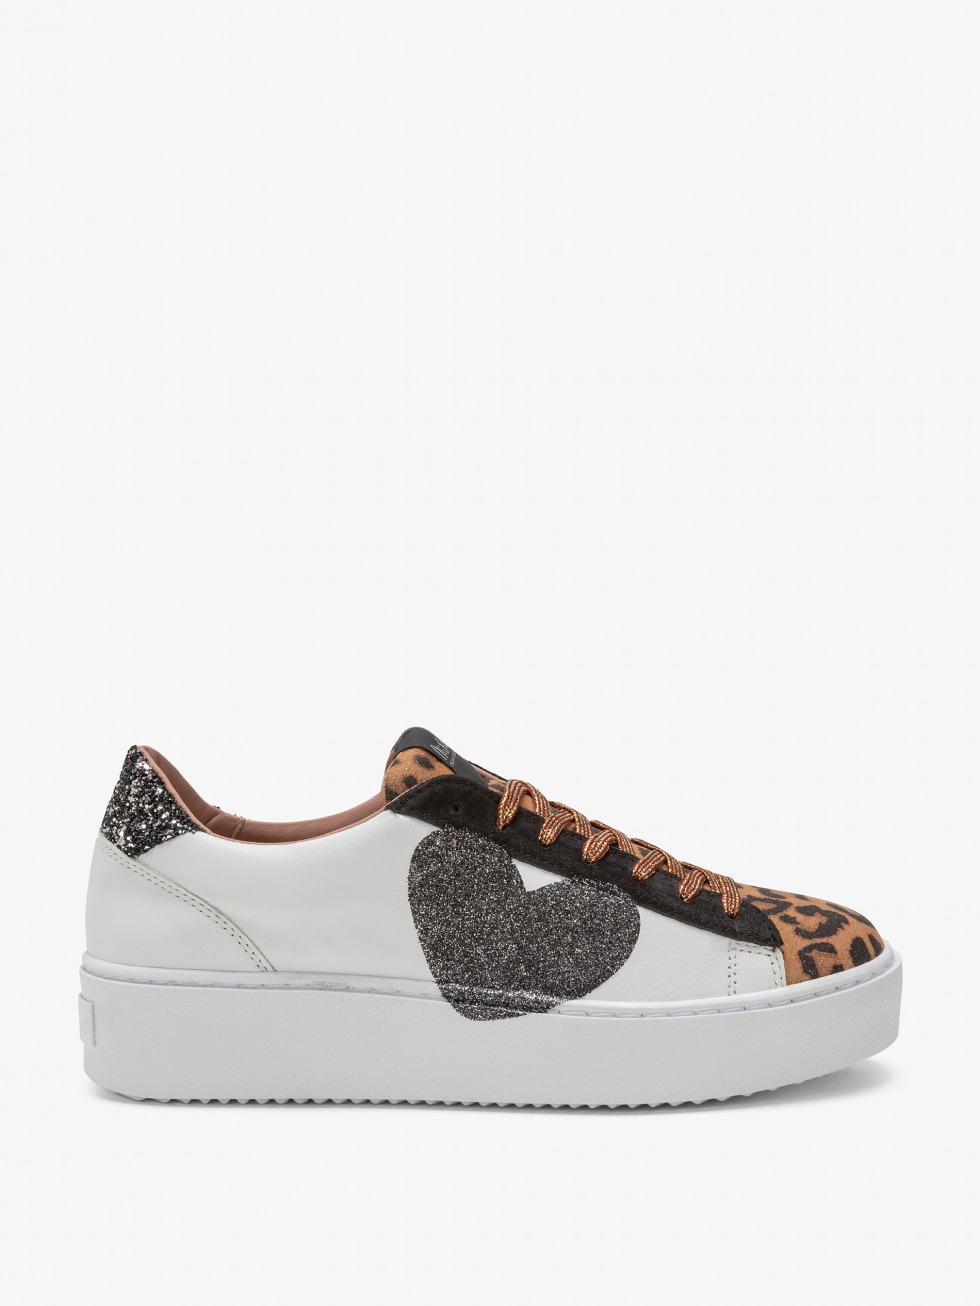 Cosmopolitan Shine Leo Sneakers - Glitter Heart